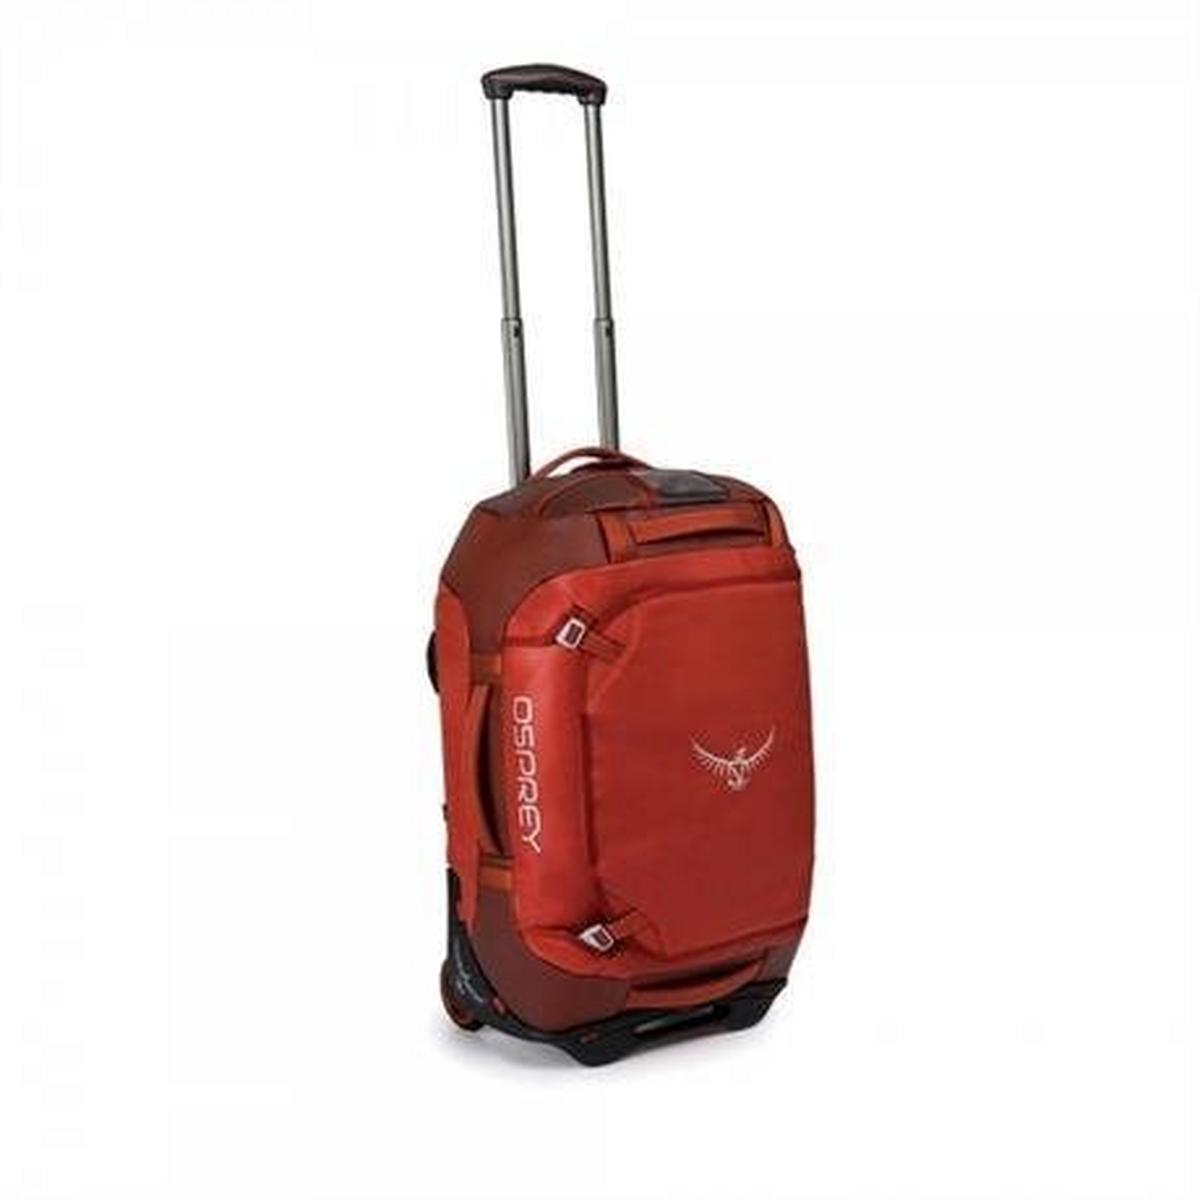 Osprey Travel Bag Rolling Transporter 40 Ruffian Red